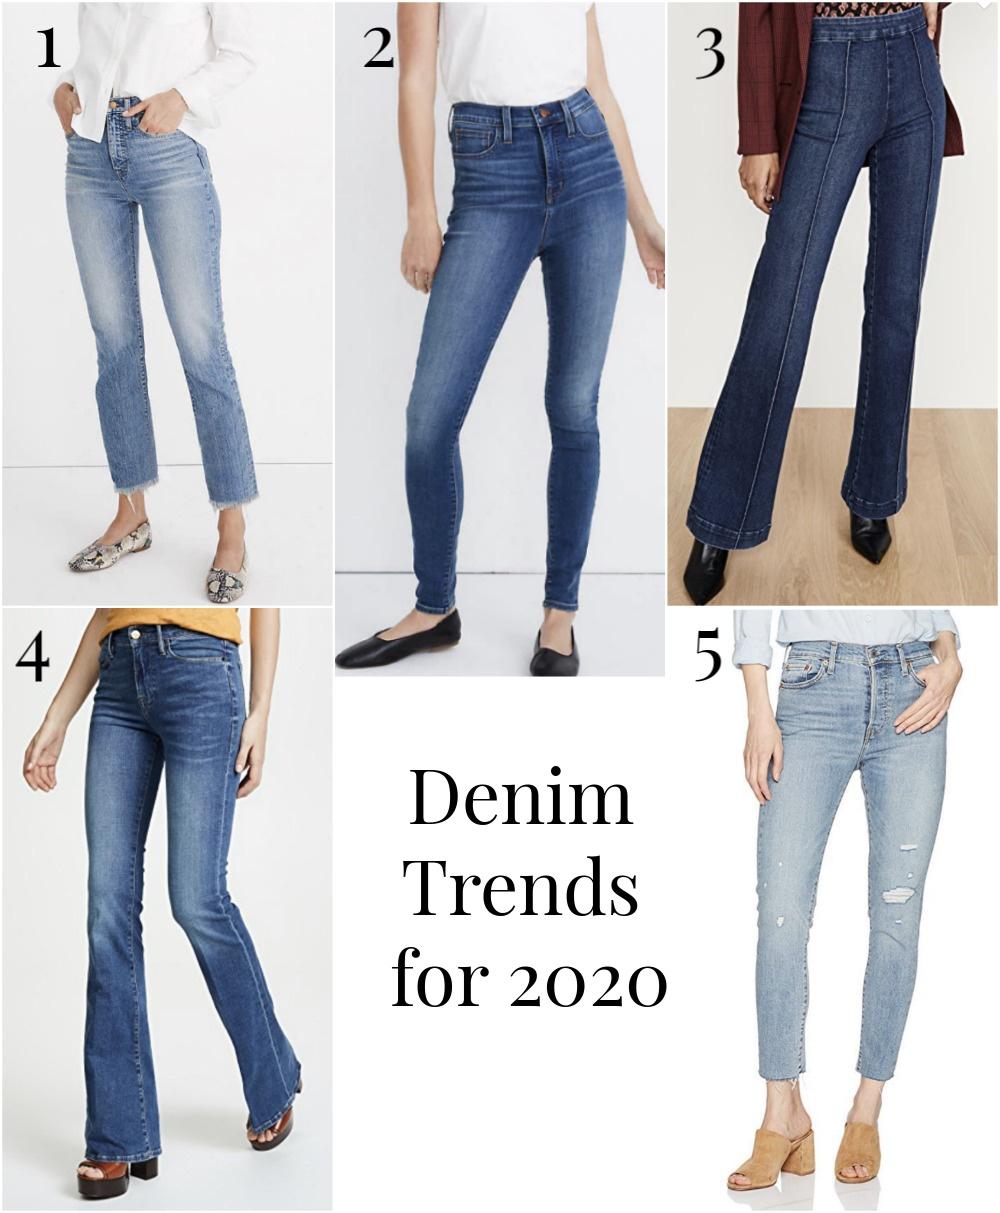 Denim Trends for 2020